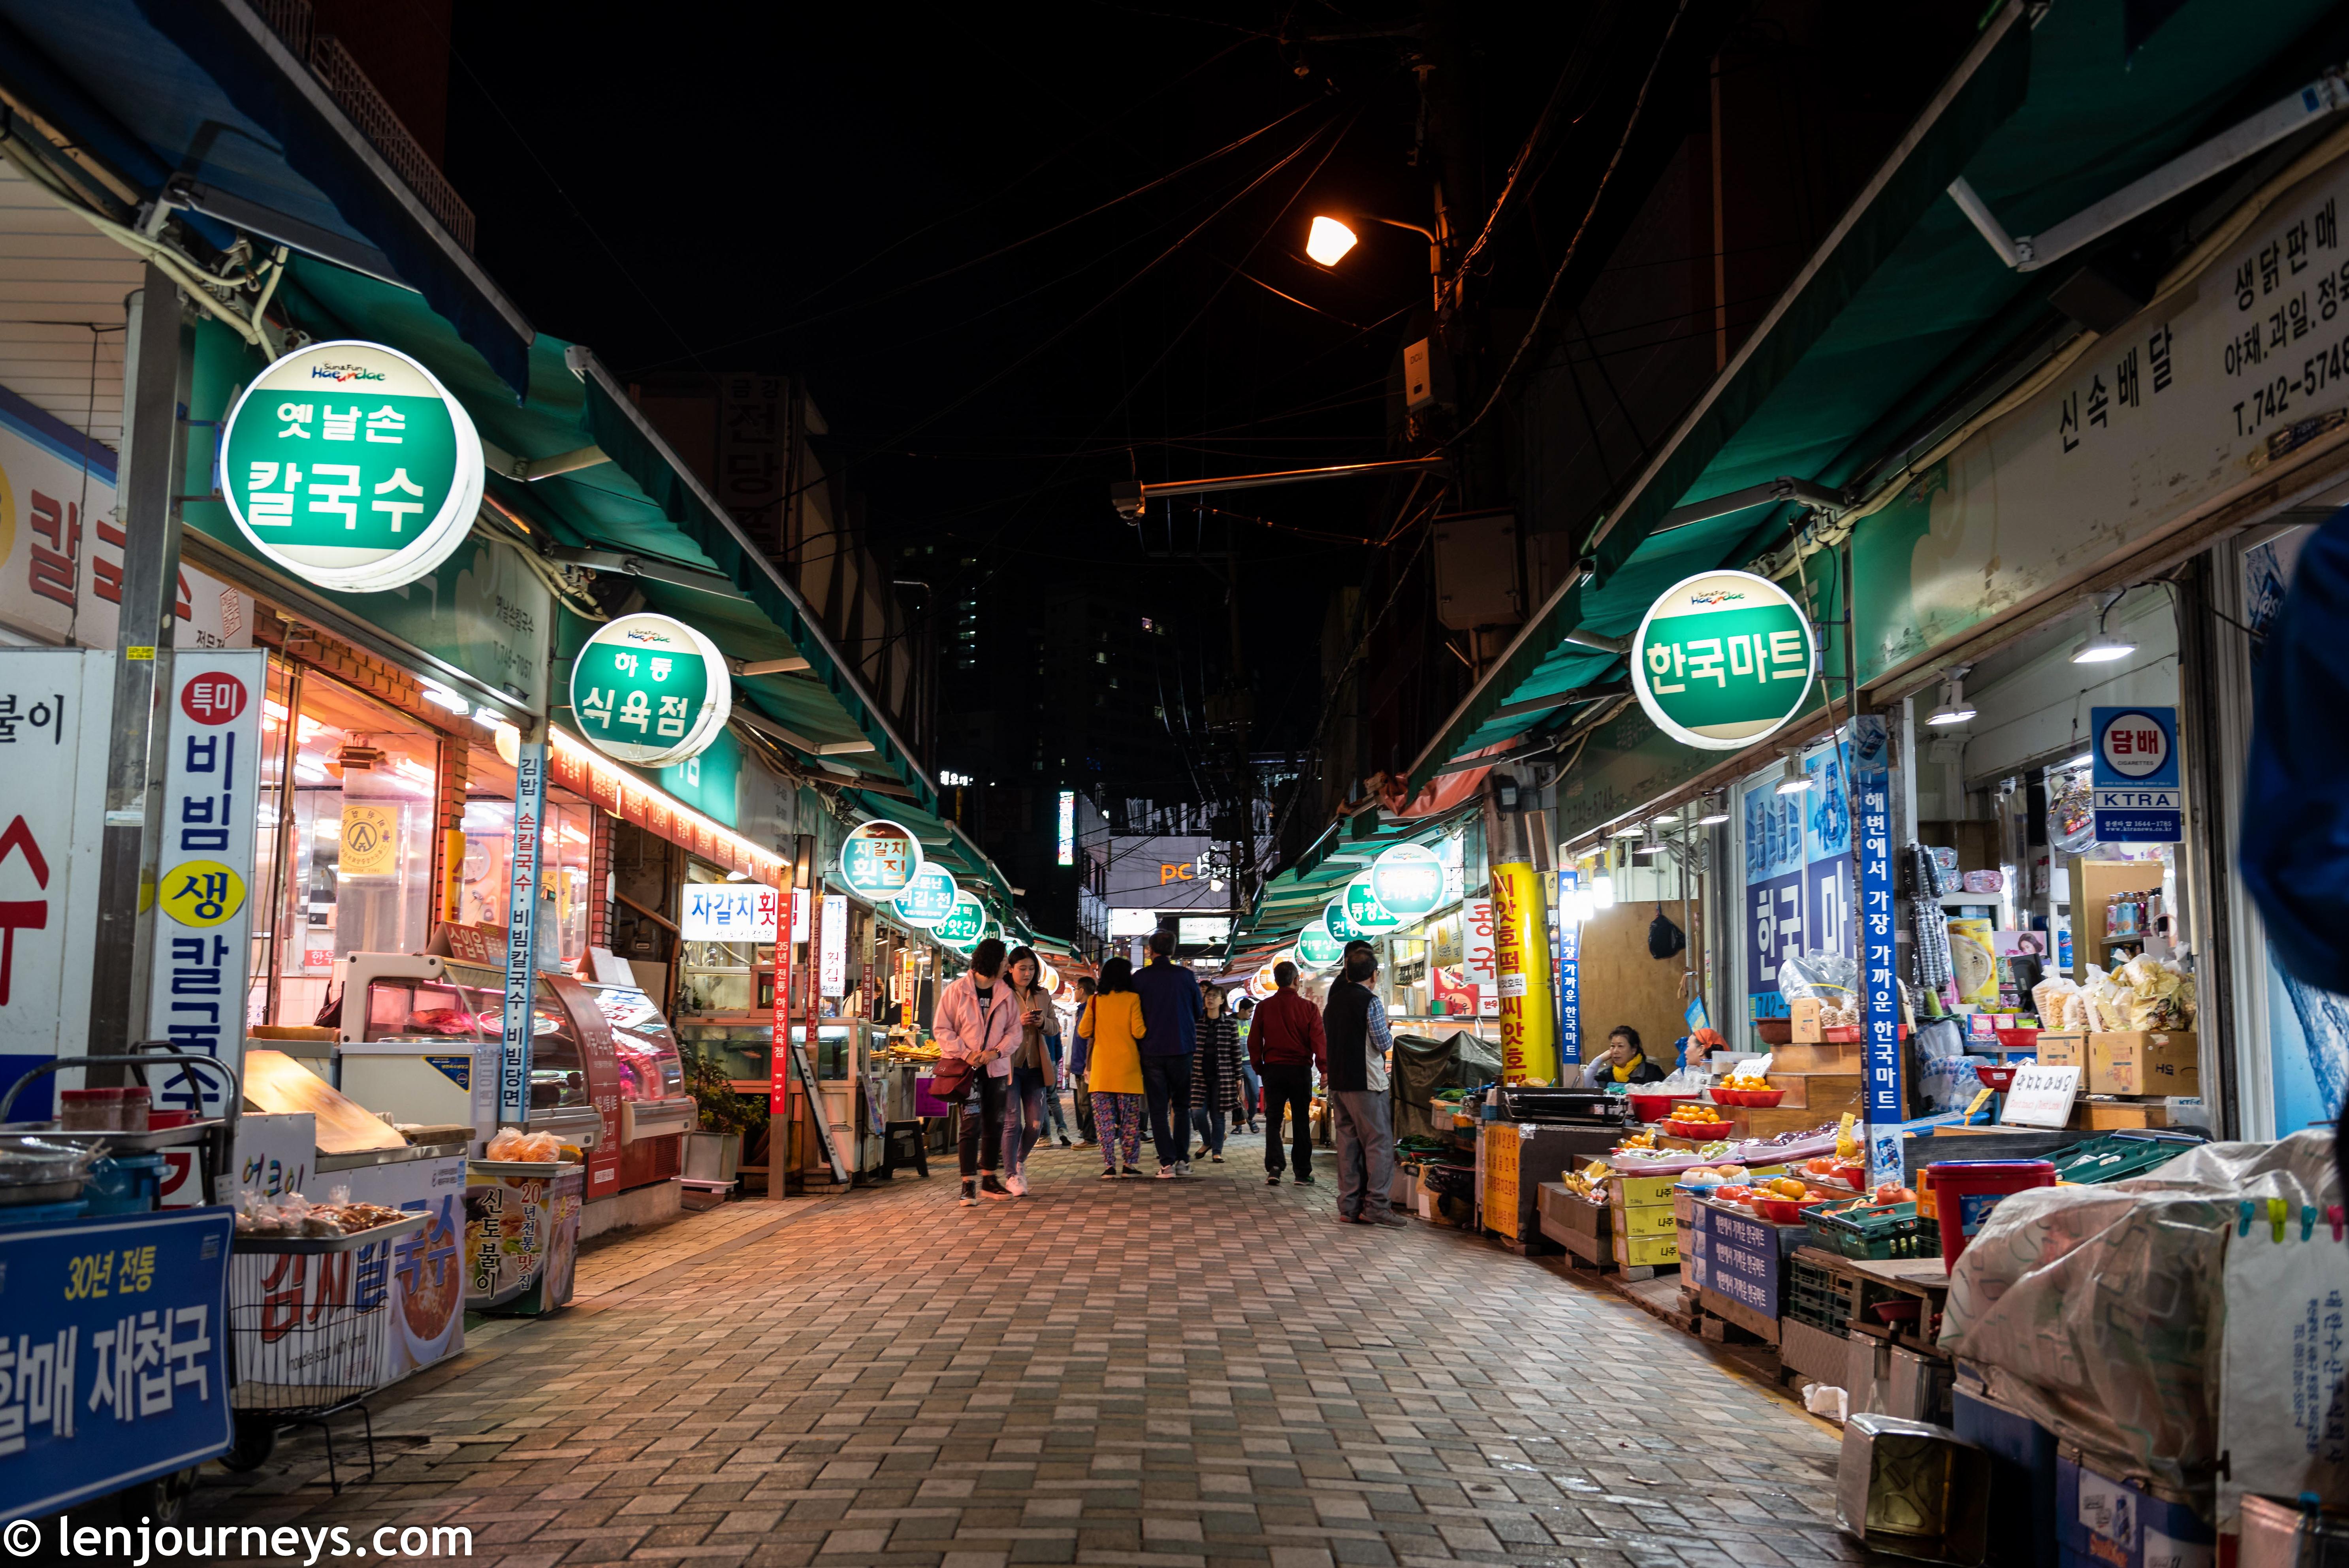 Market in Haeundae